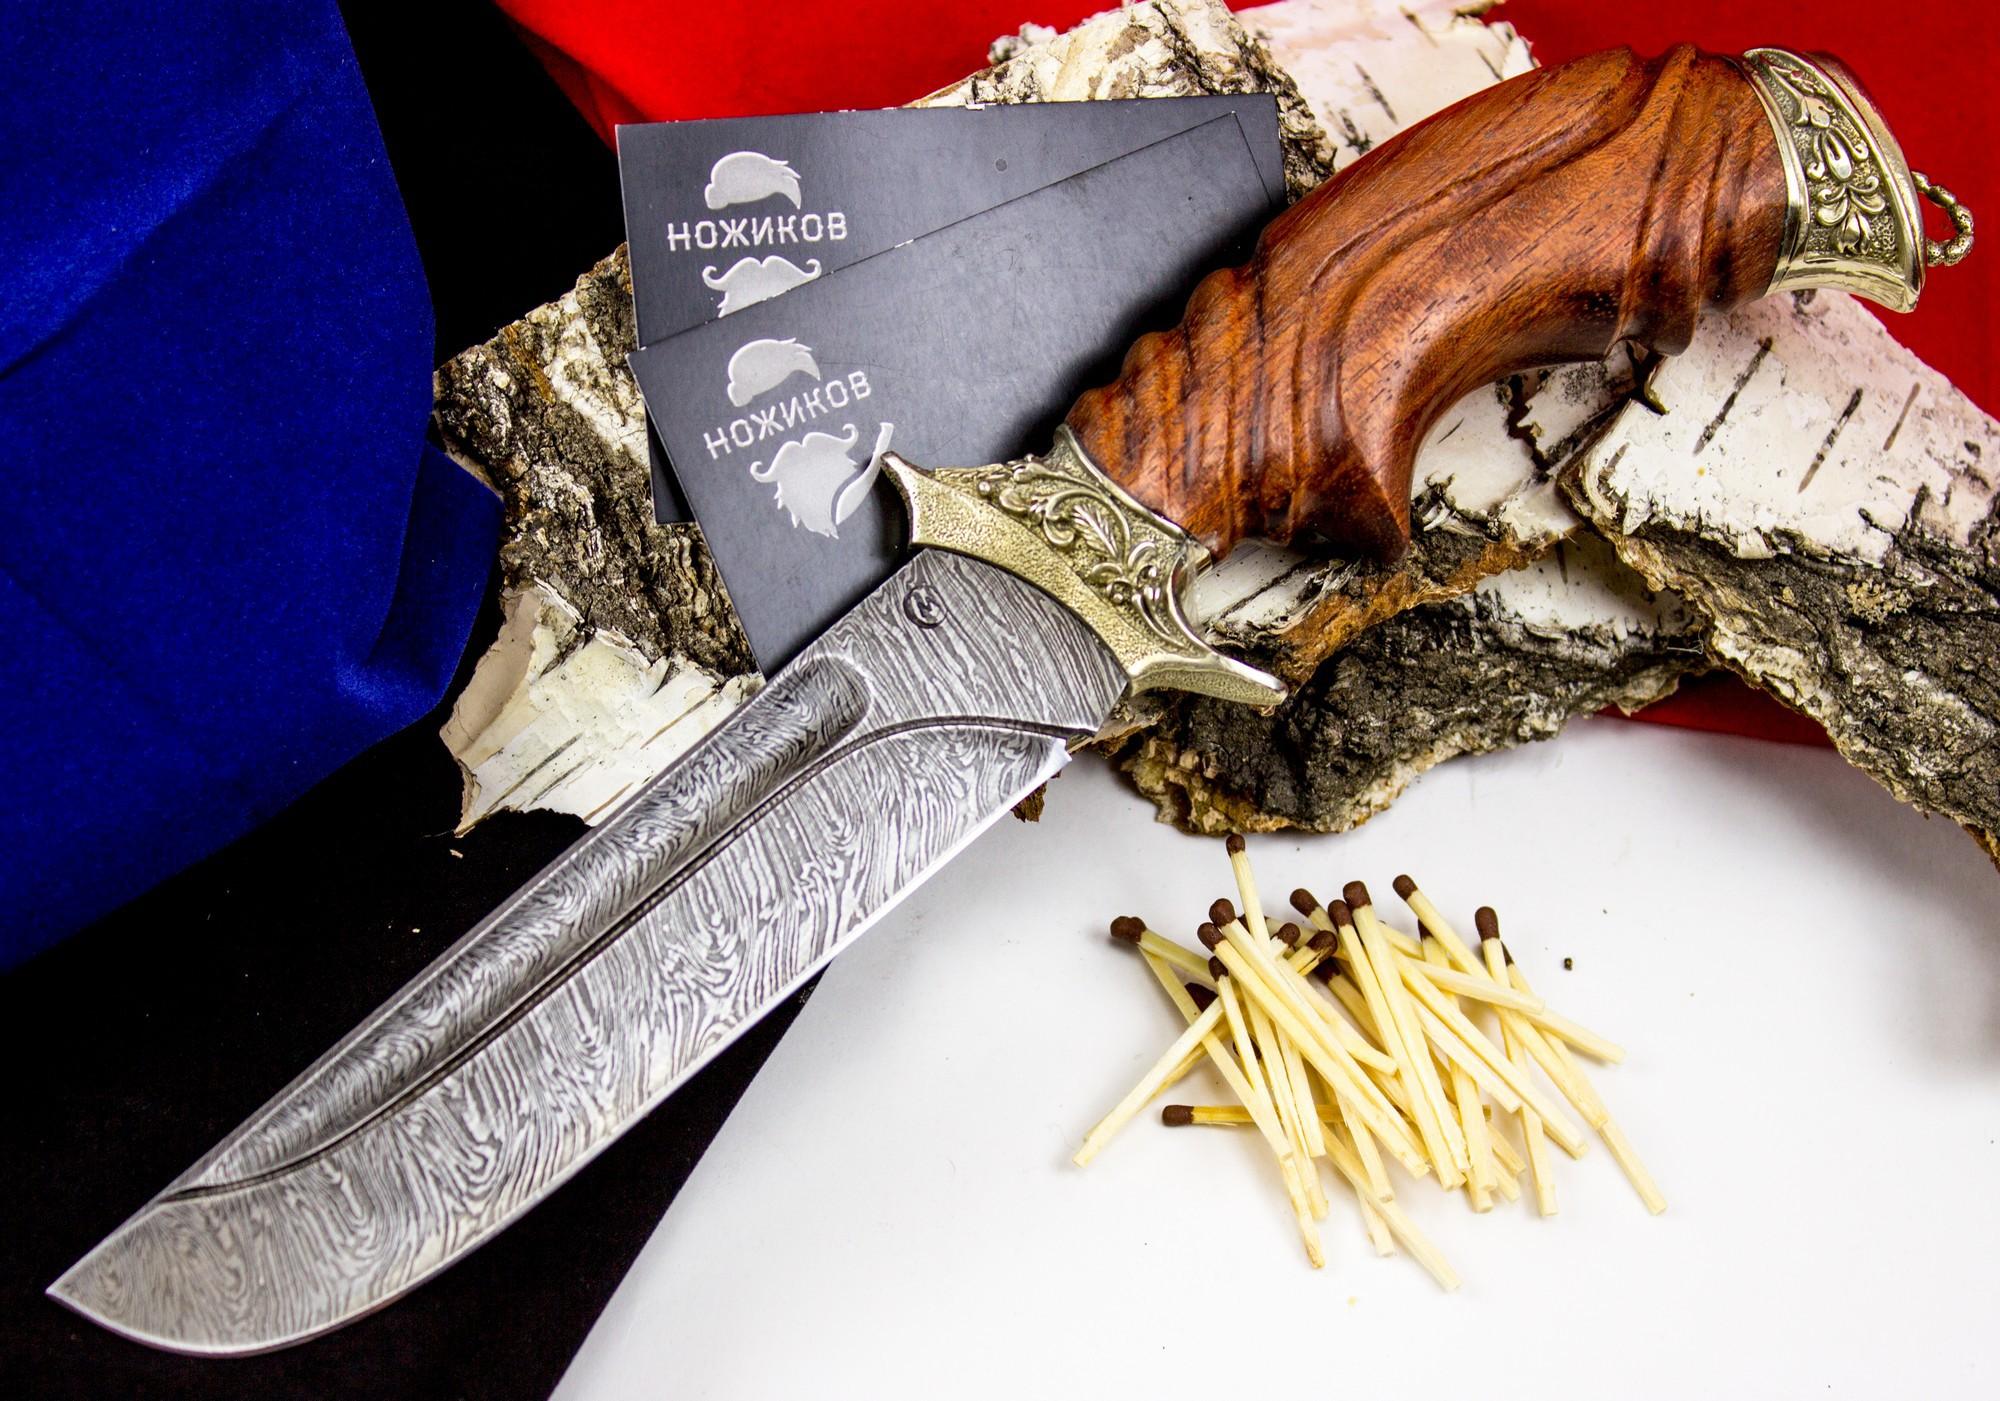 Нож Варяг с резной рукоятью , дамасская сталь от Кузница Семина